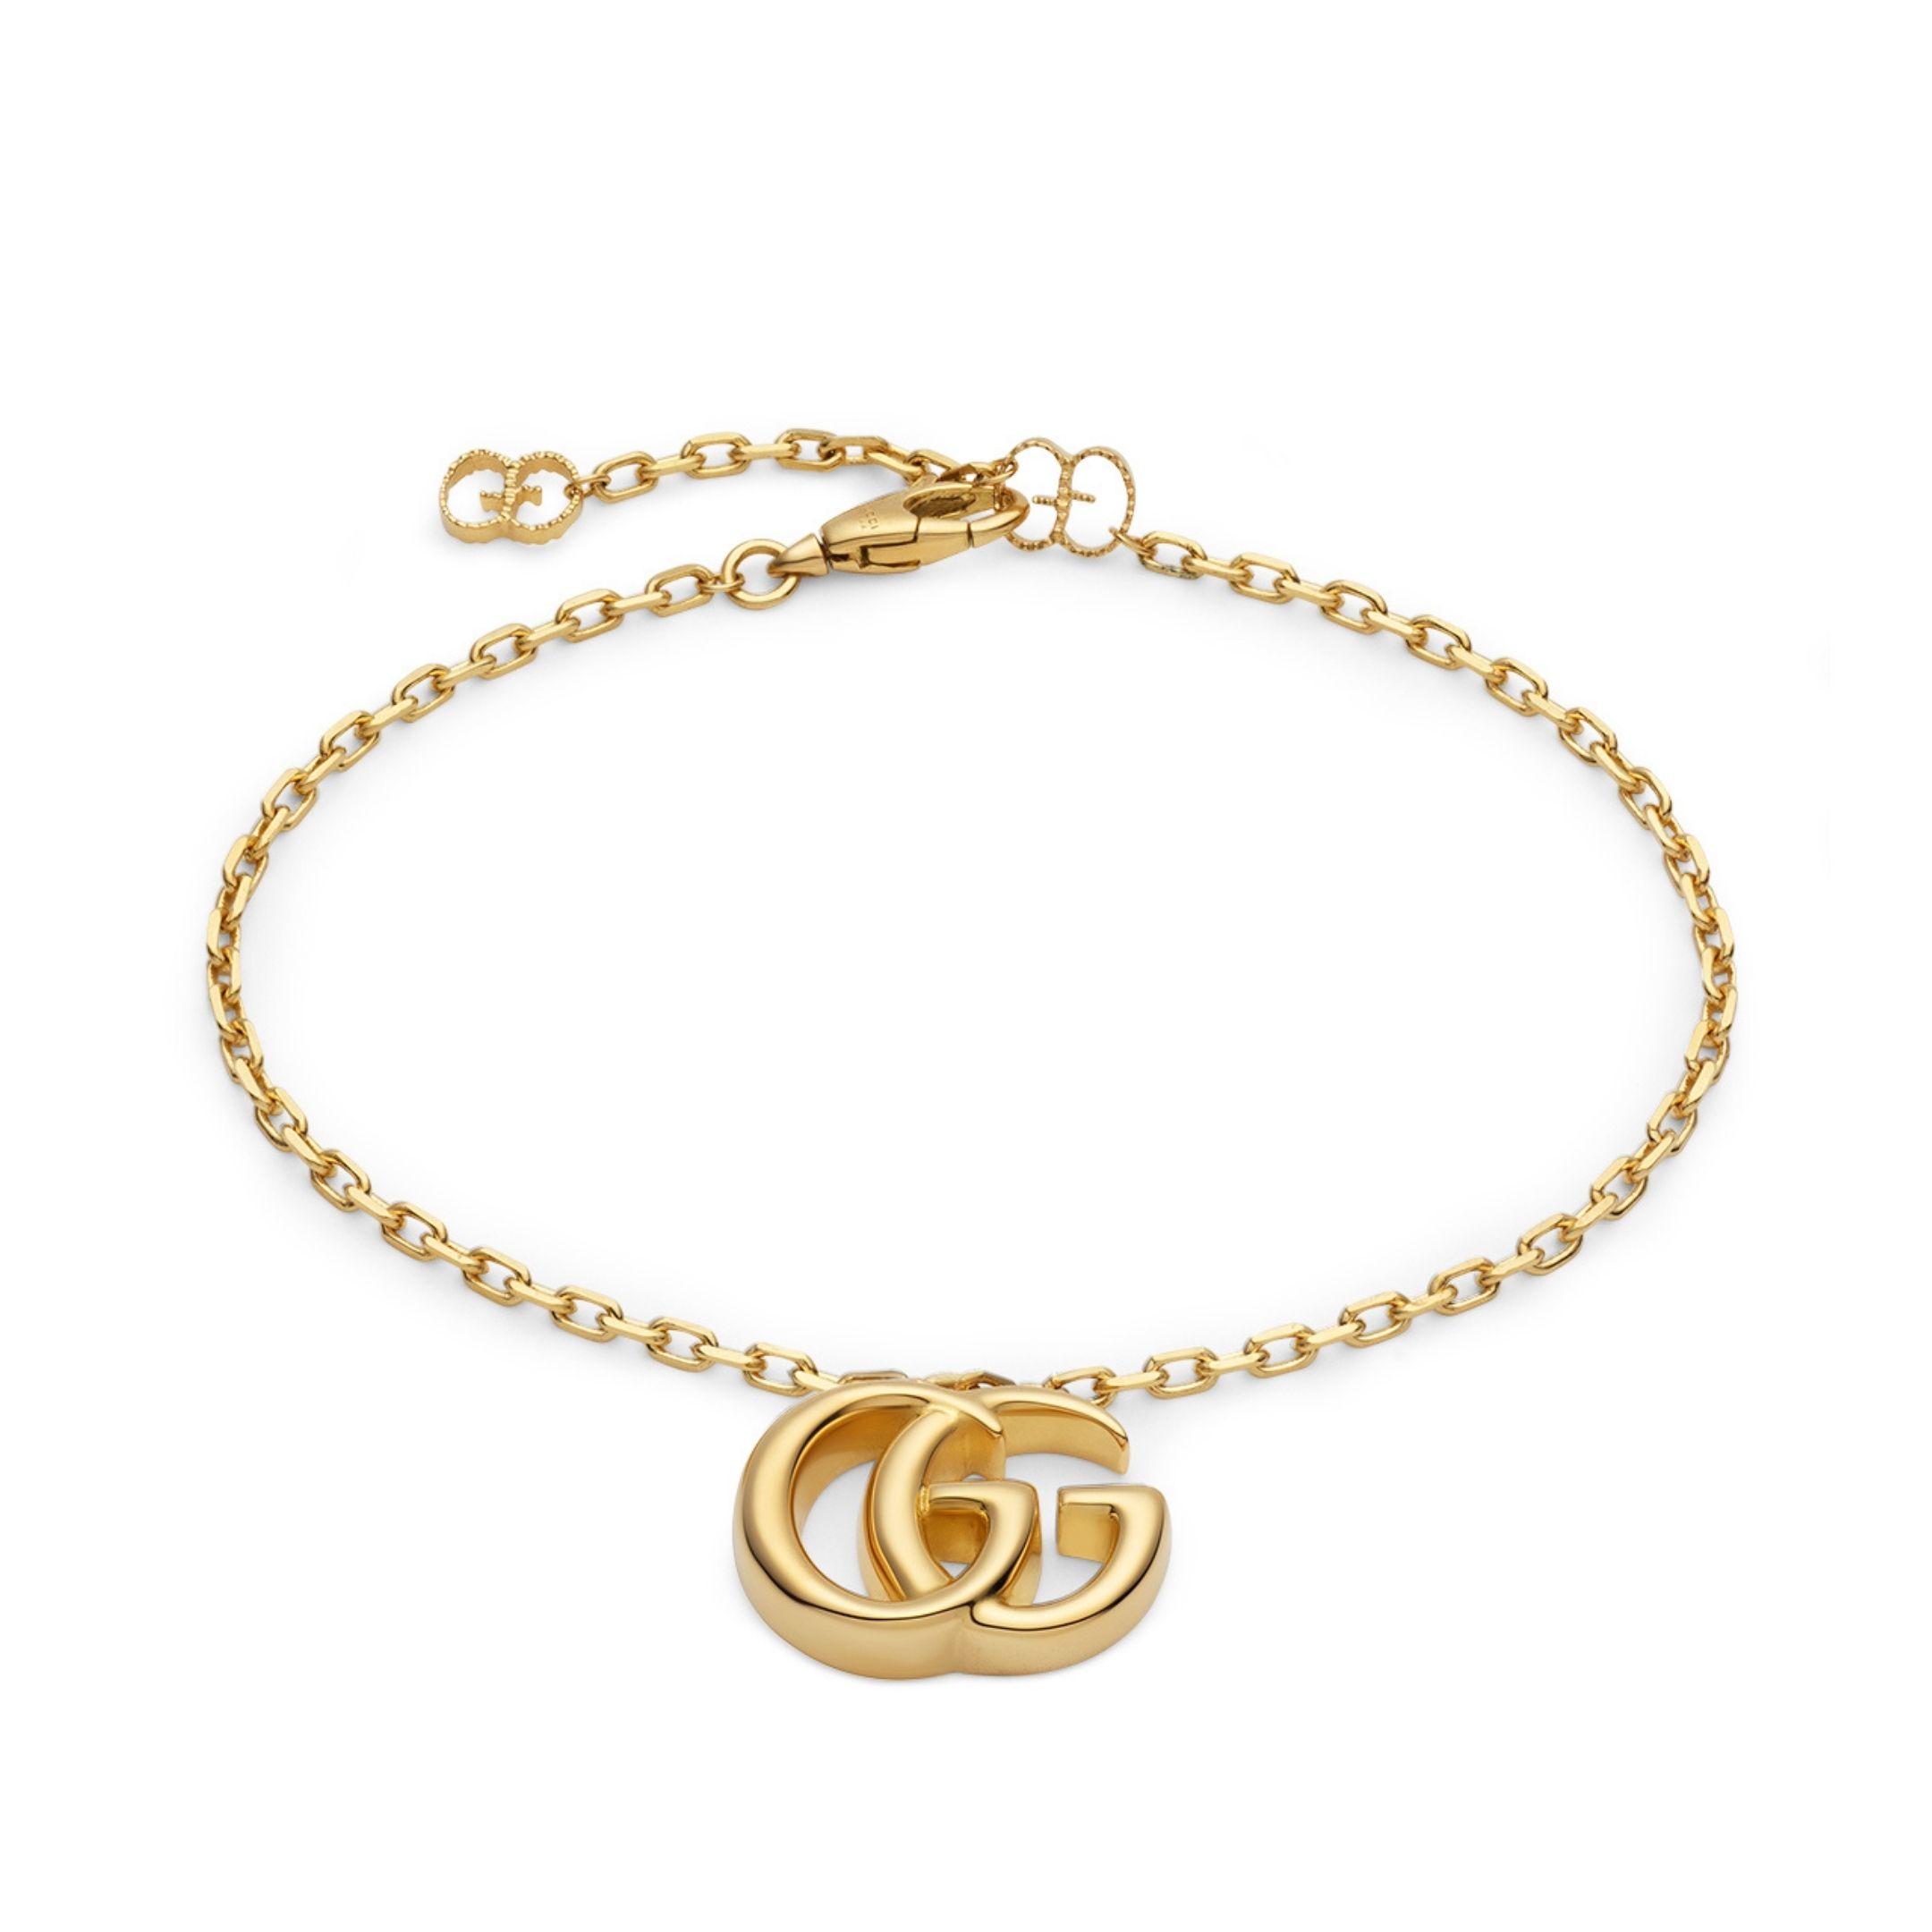 gucci bracelet 501676 gg running bracciale sconto discount